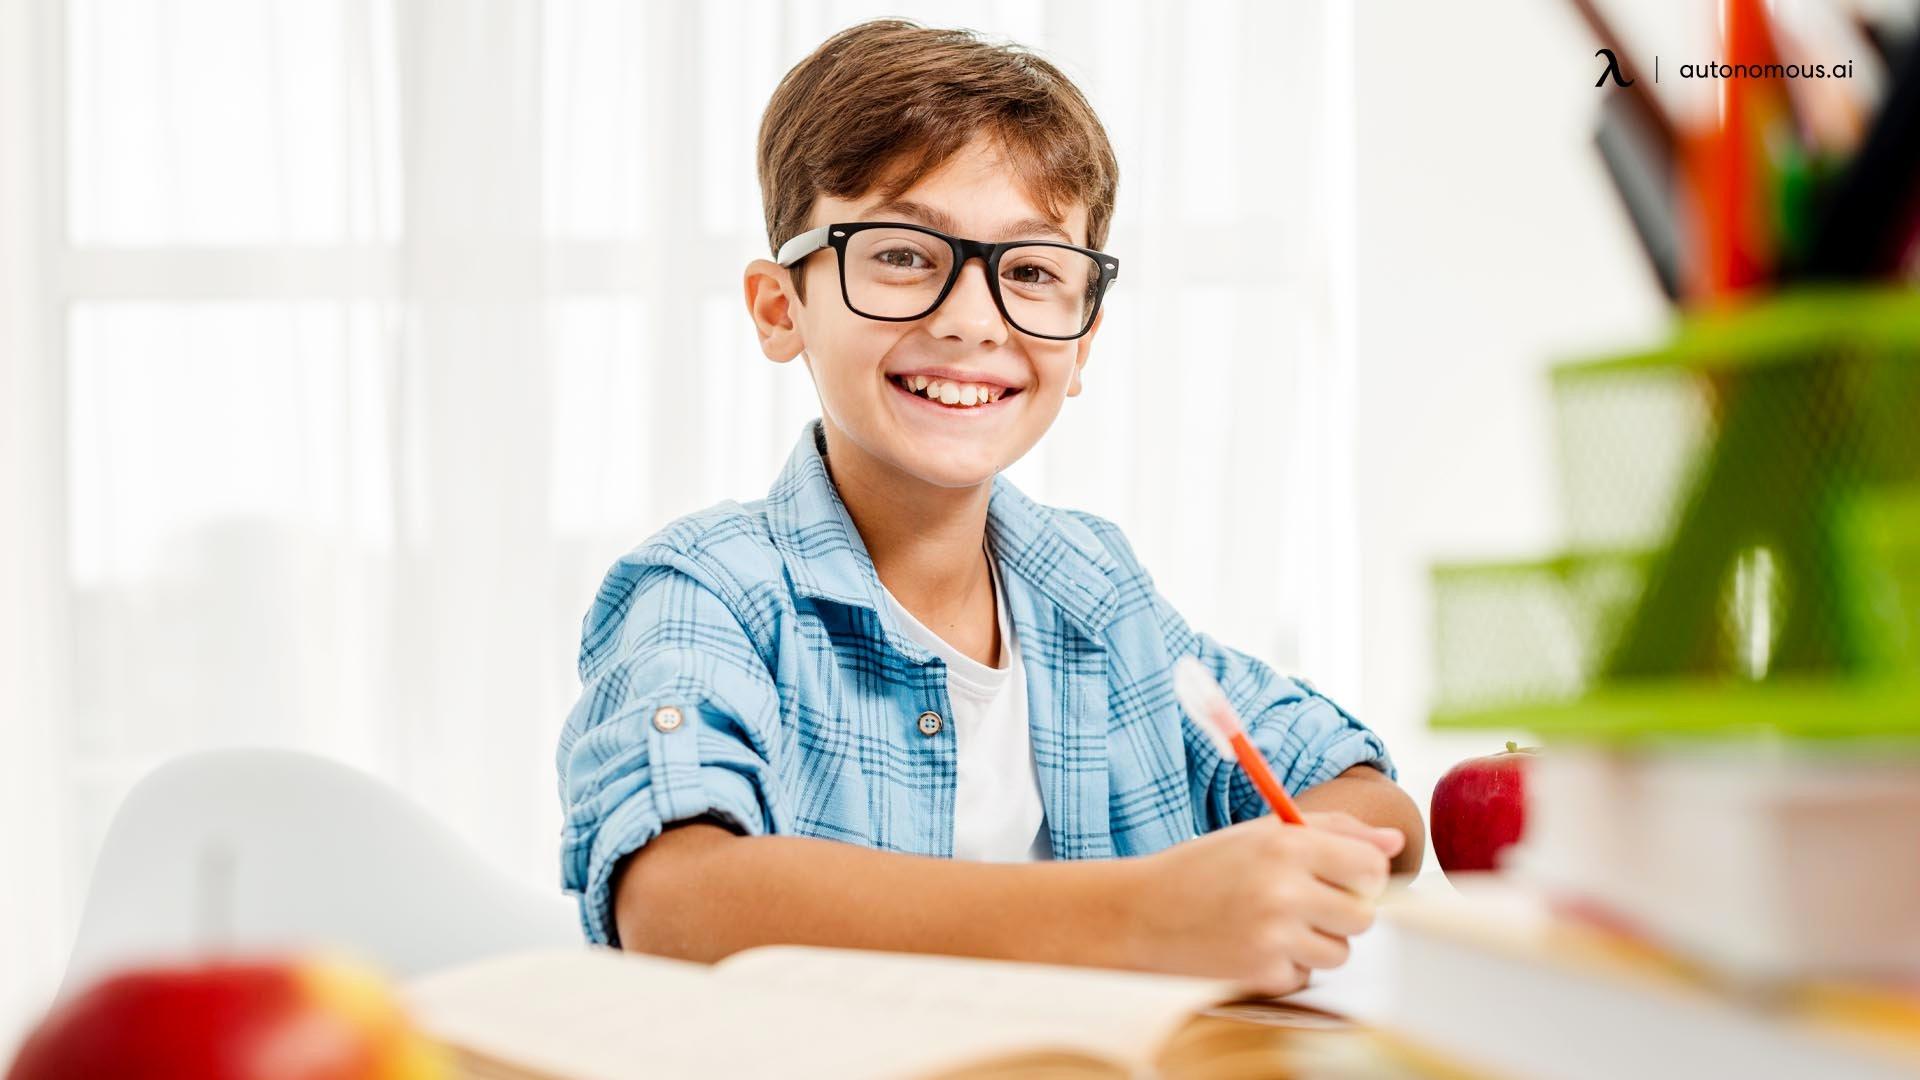 how can i homeschool in california